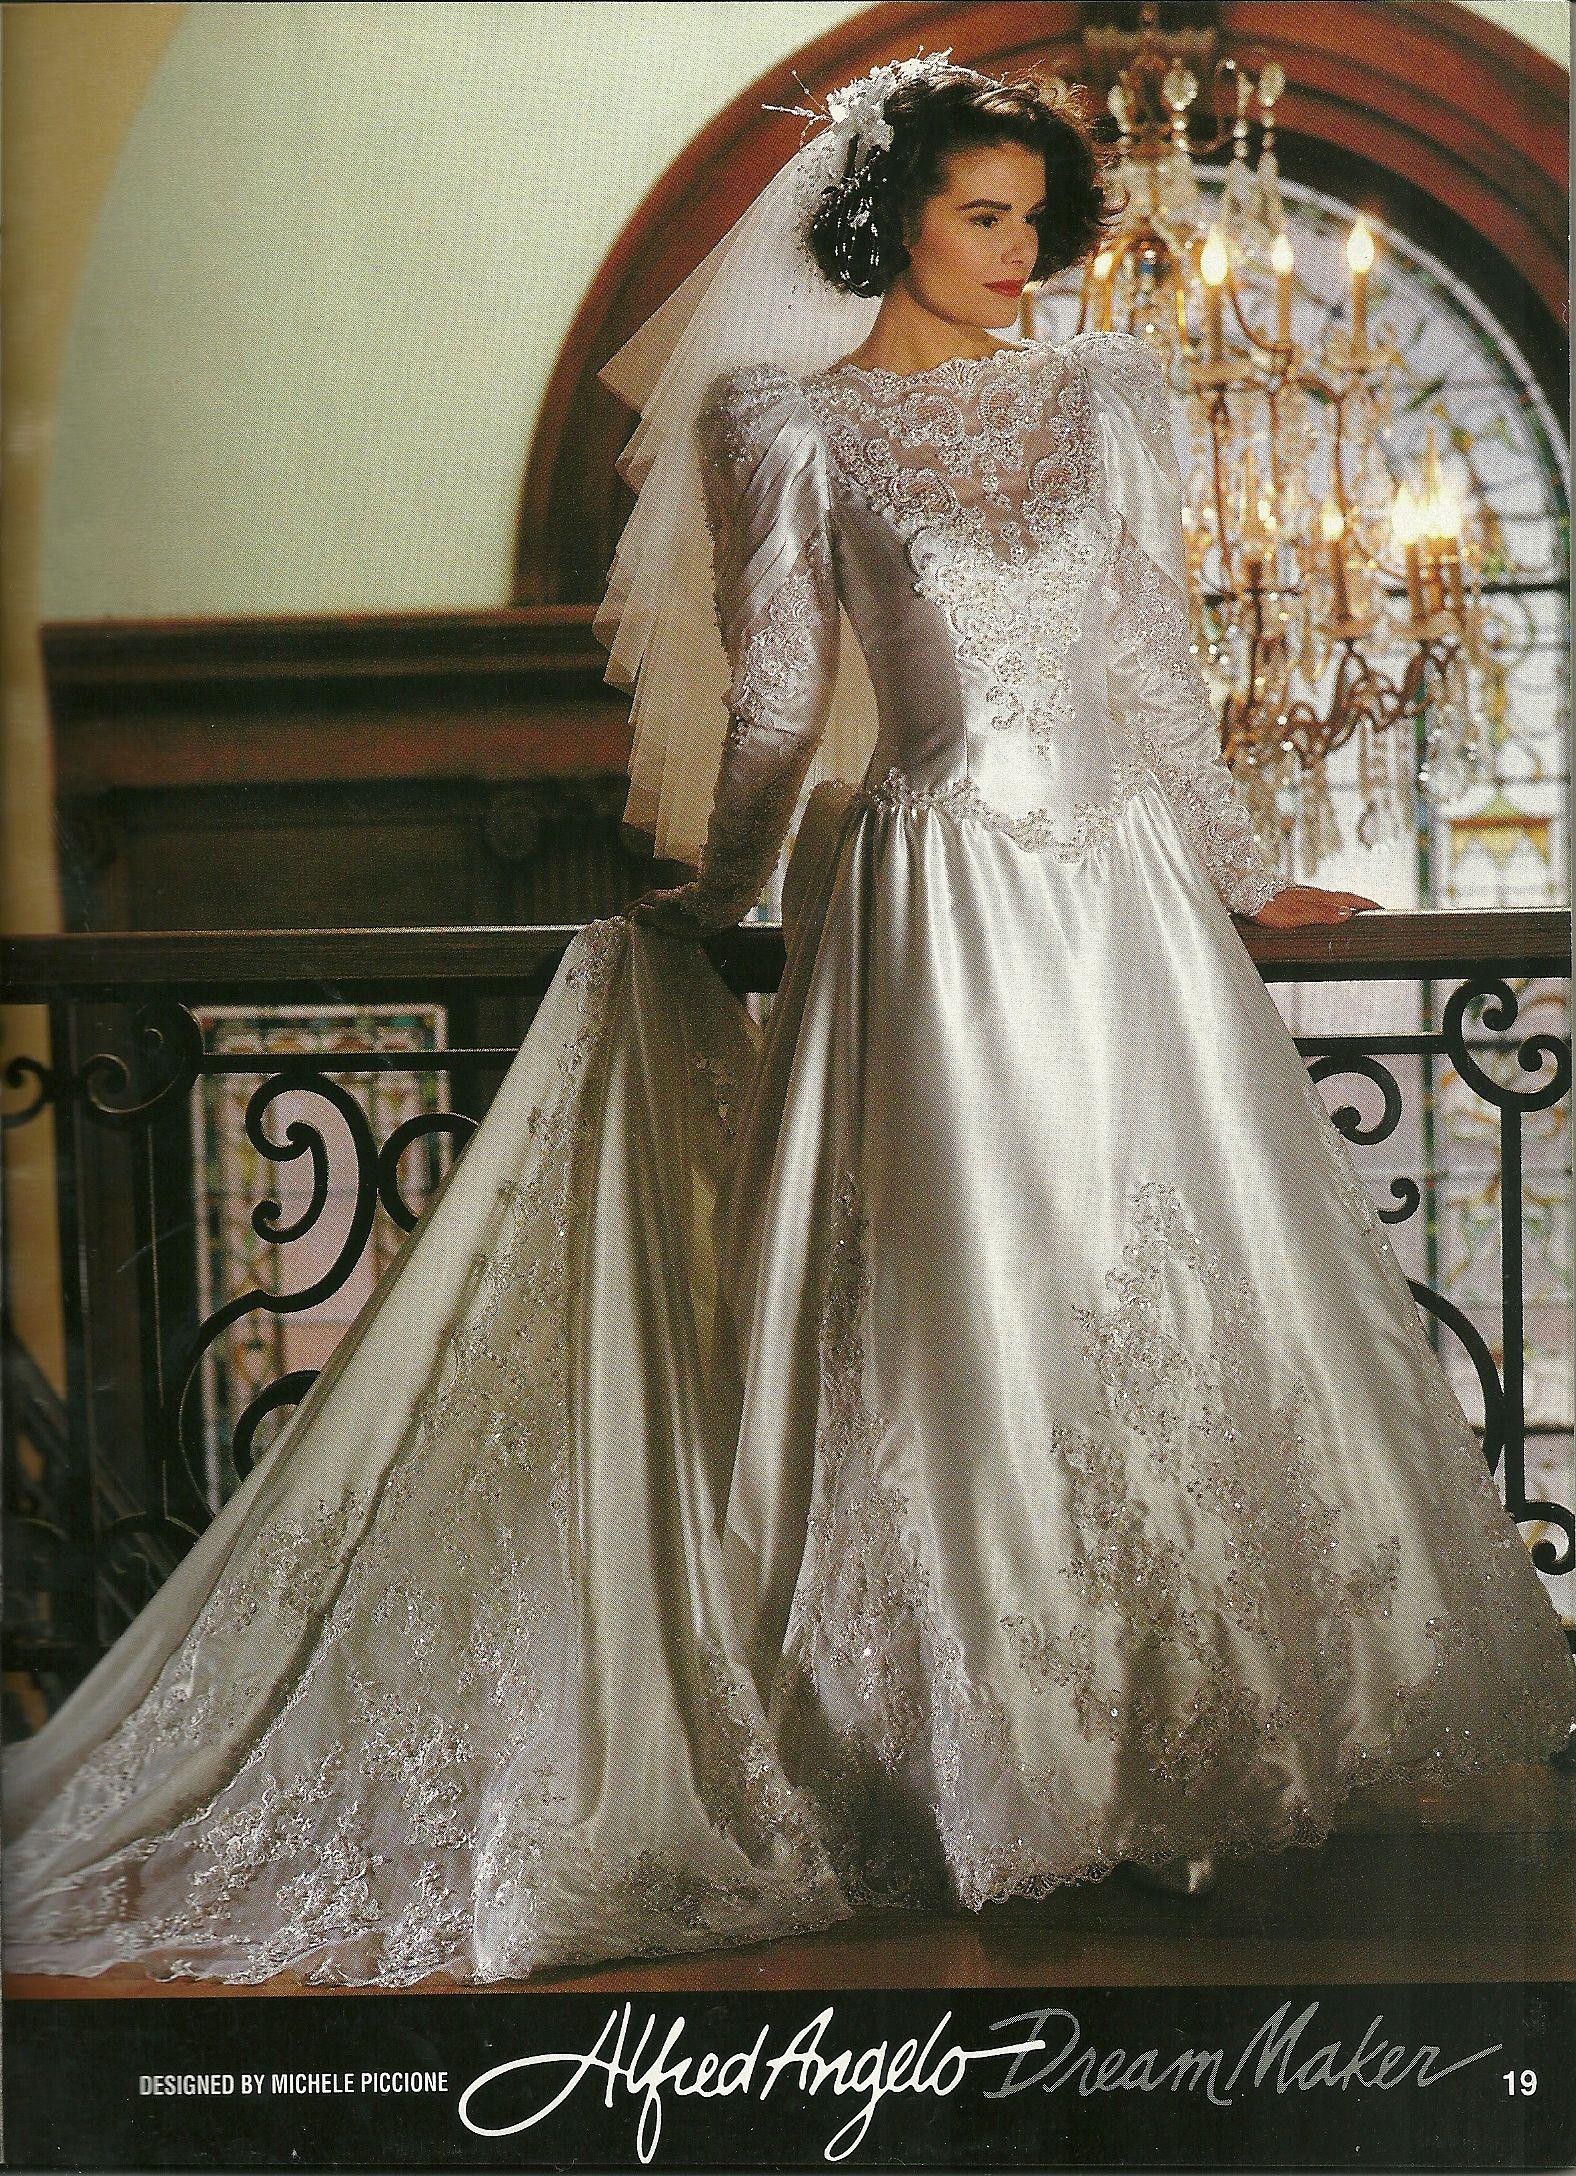 Alfred angelo belle dress 2018 summer